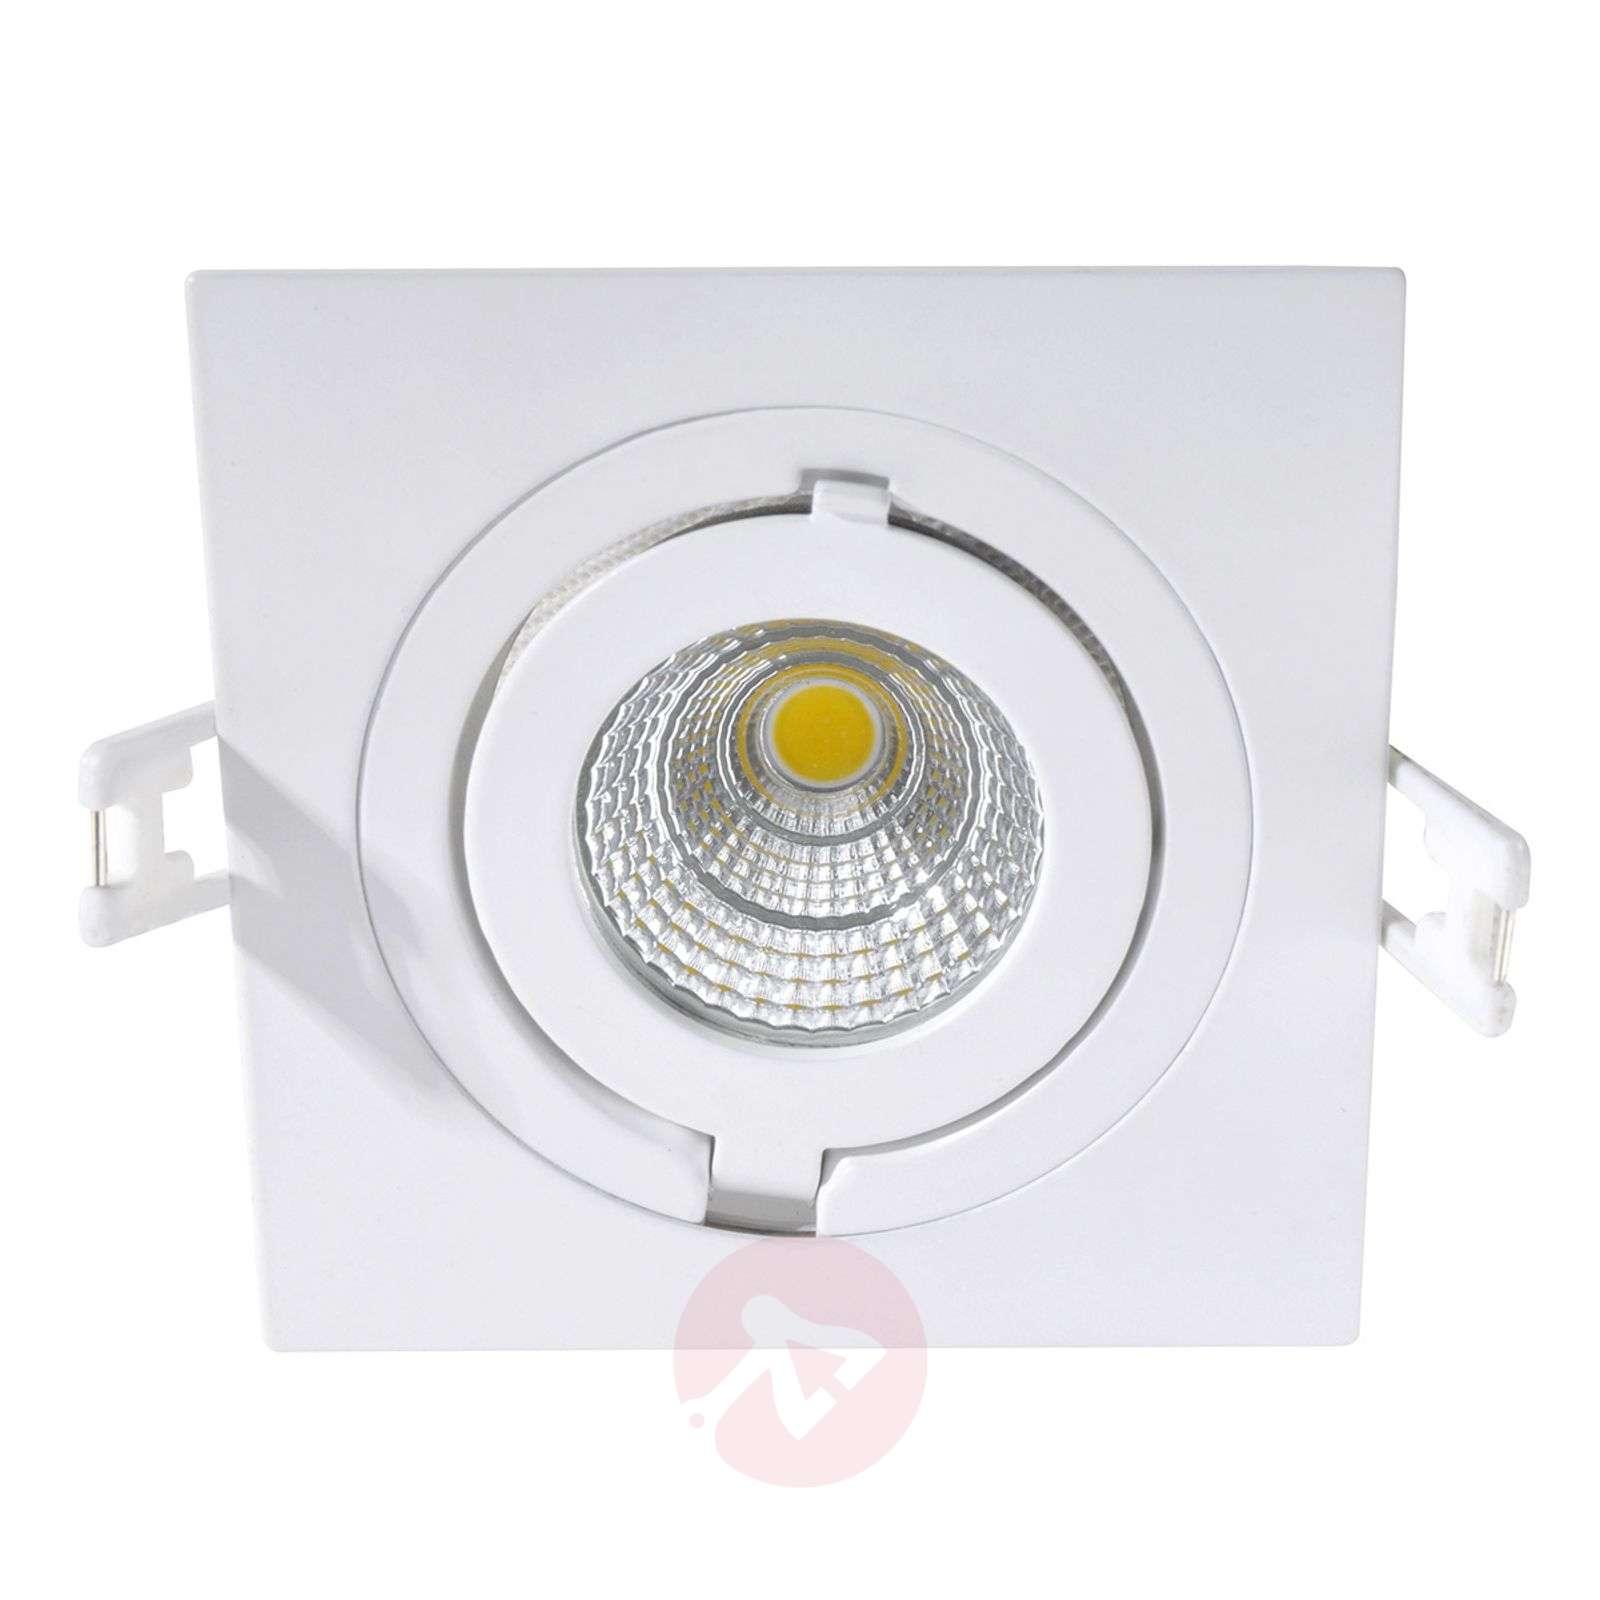 Kirkas Como-LED-uppokohdevalo, neliskulmainen-3006246-01